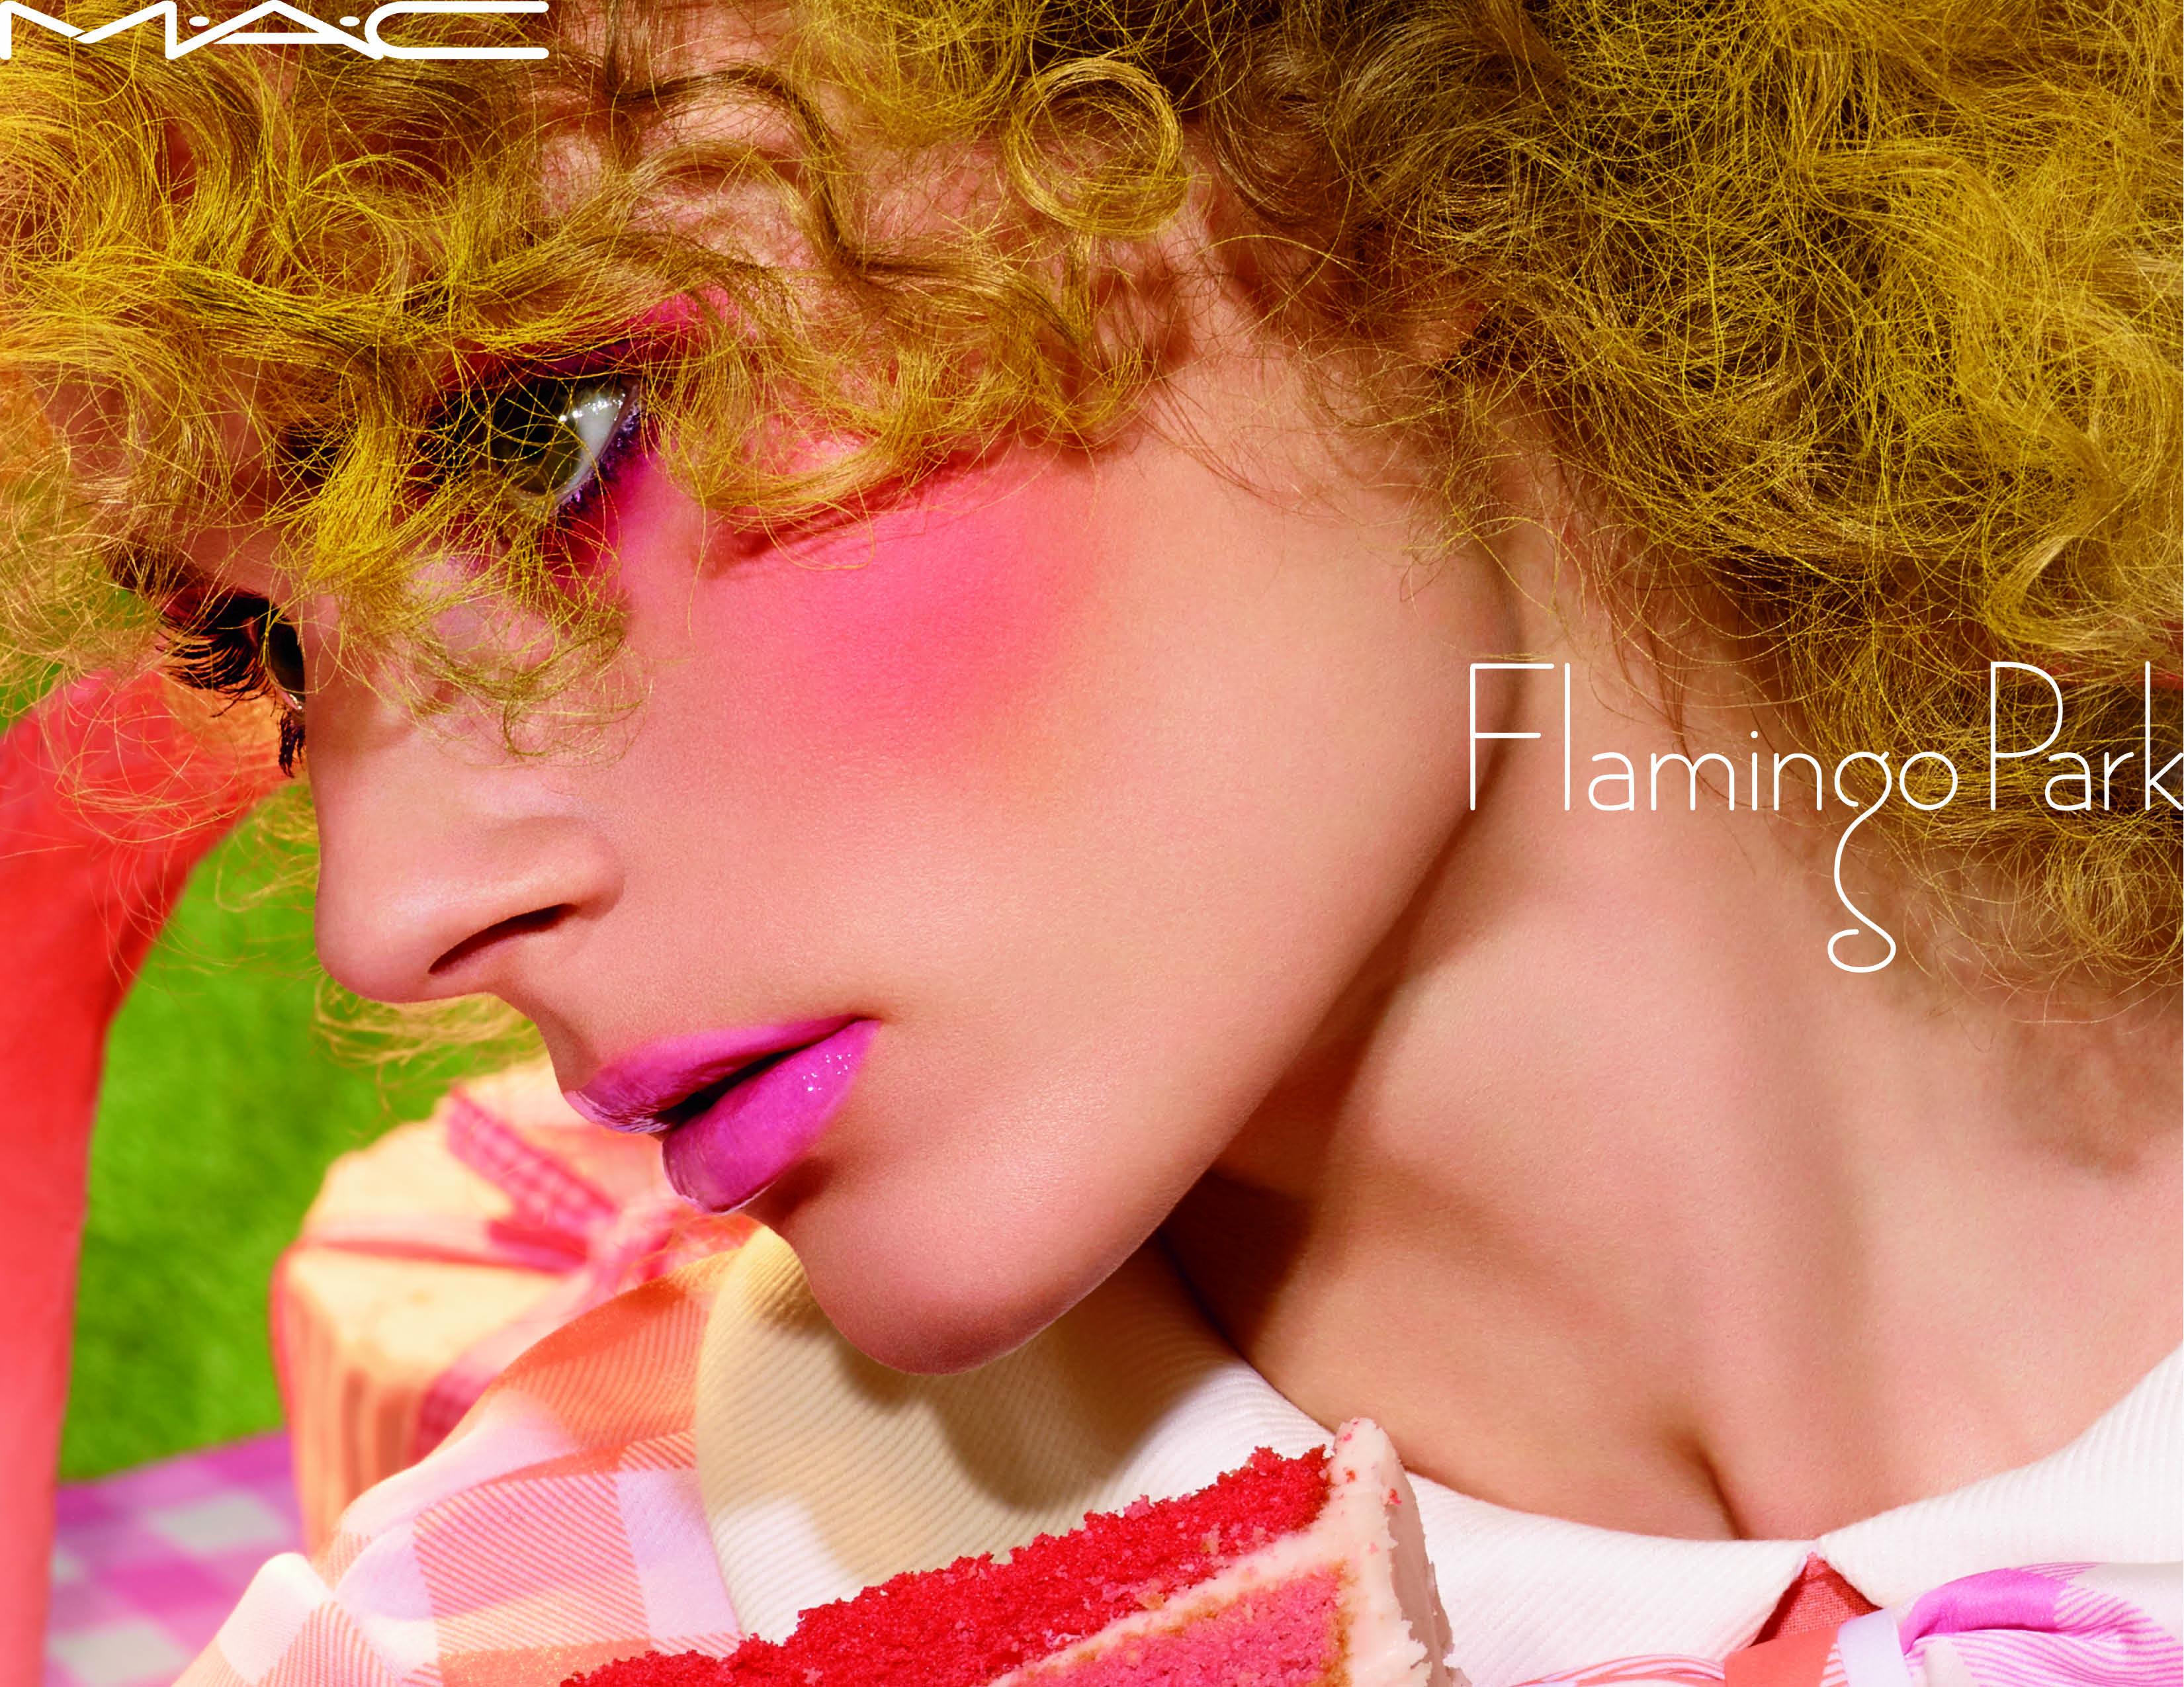 flamingo_park_beauty_3003.jpg